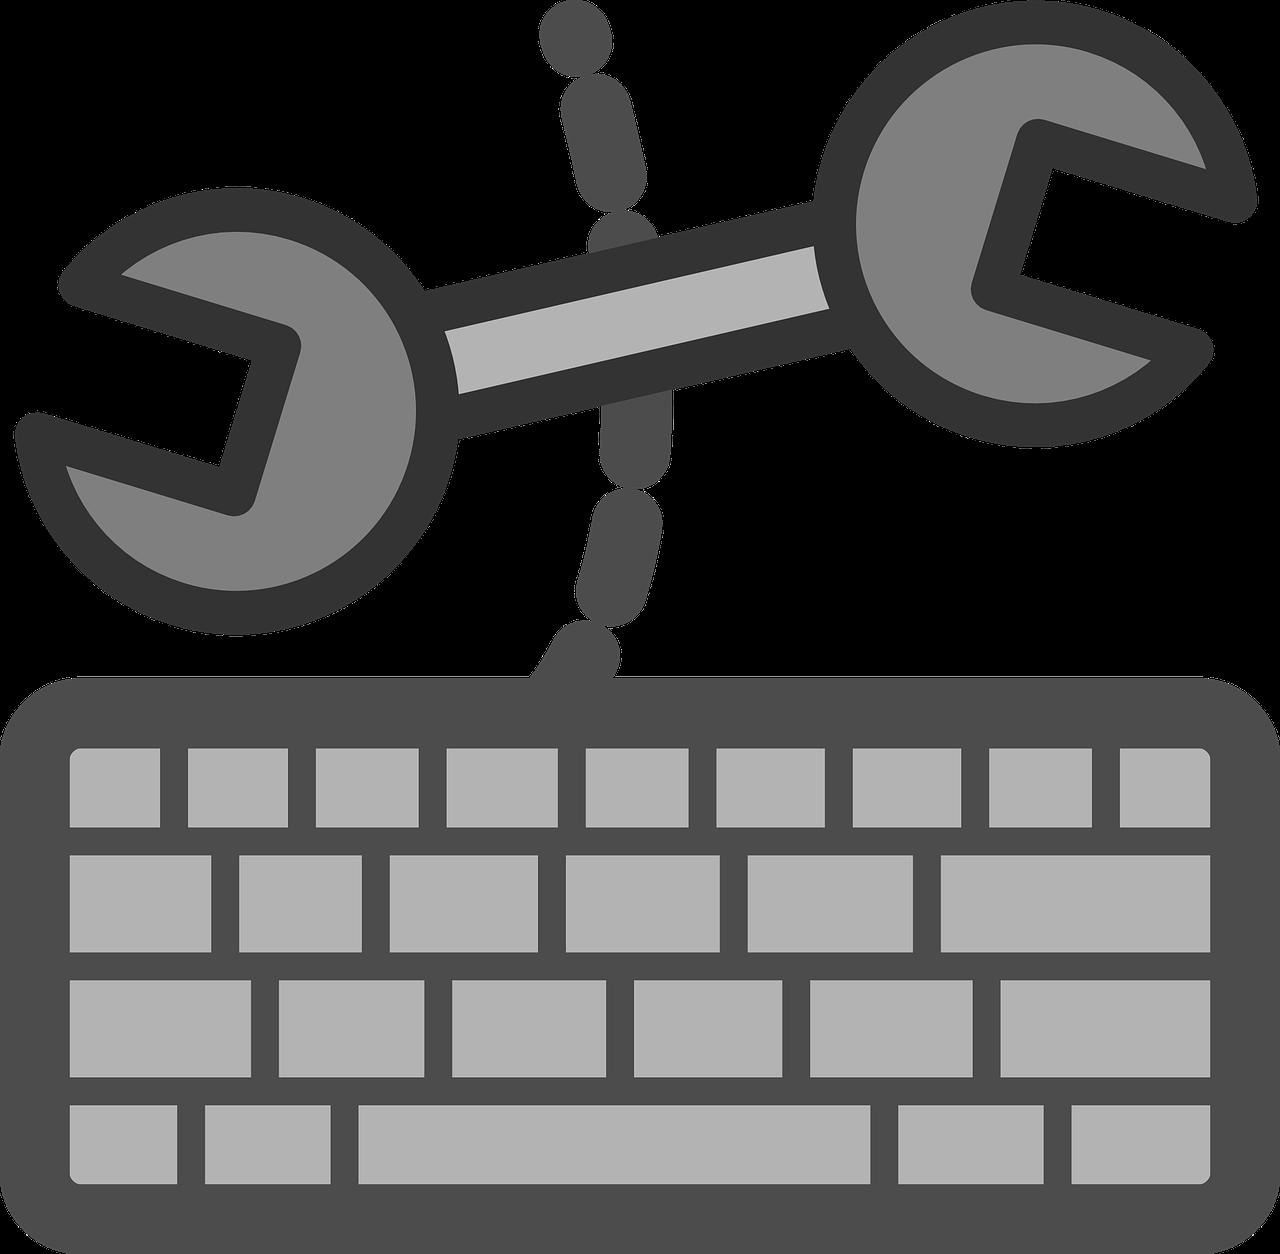 keyboard-27183_1280